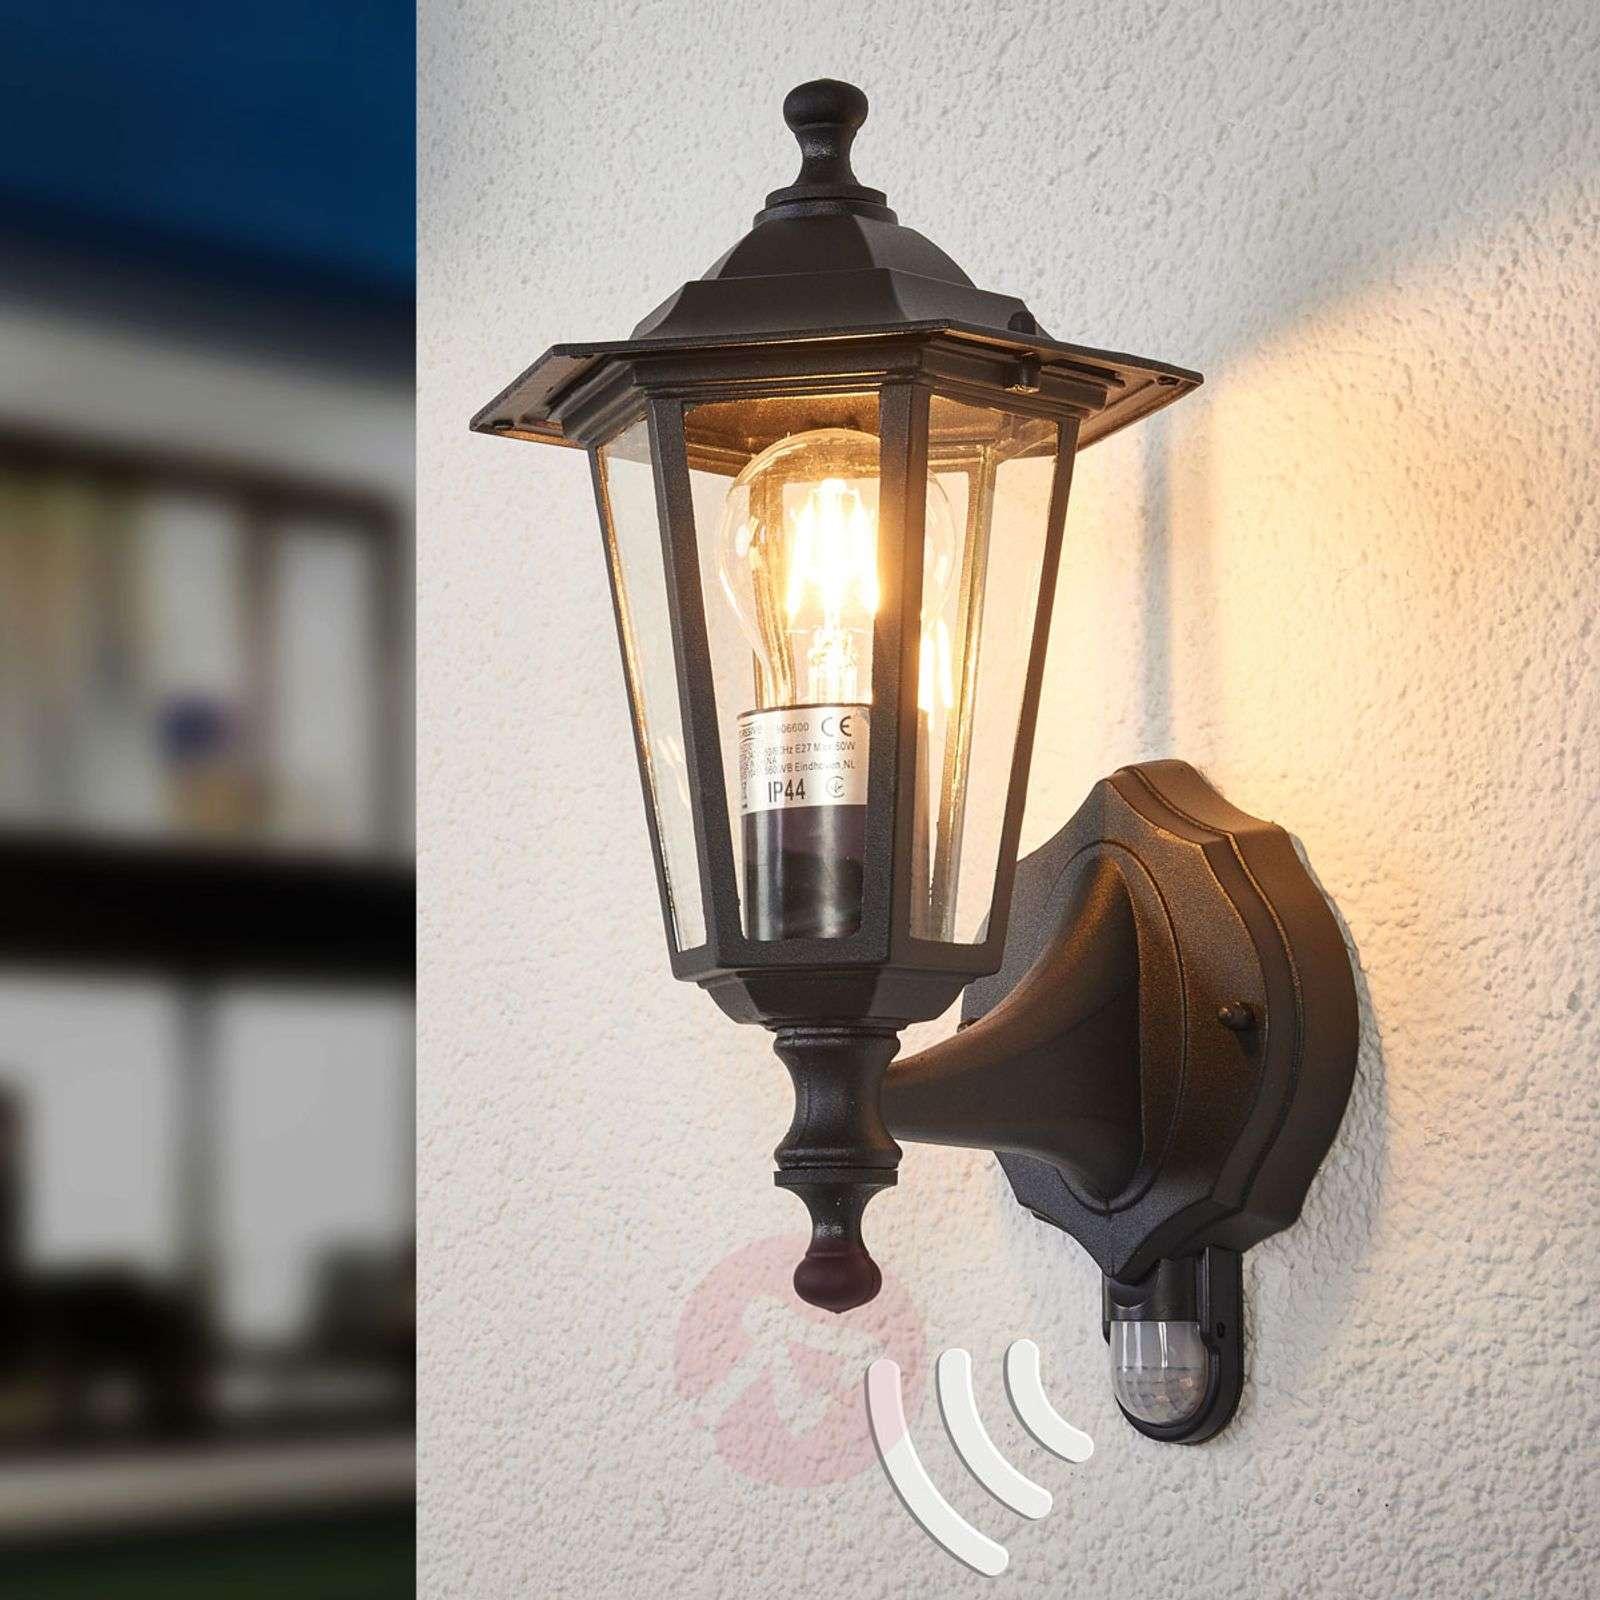 Infrared outdoor light PEKING black-6500209-02